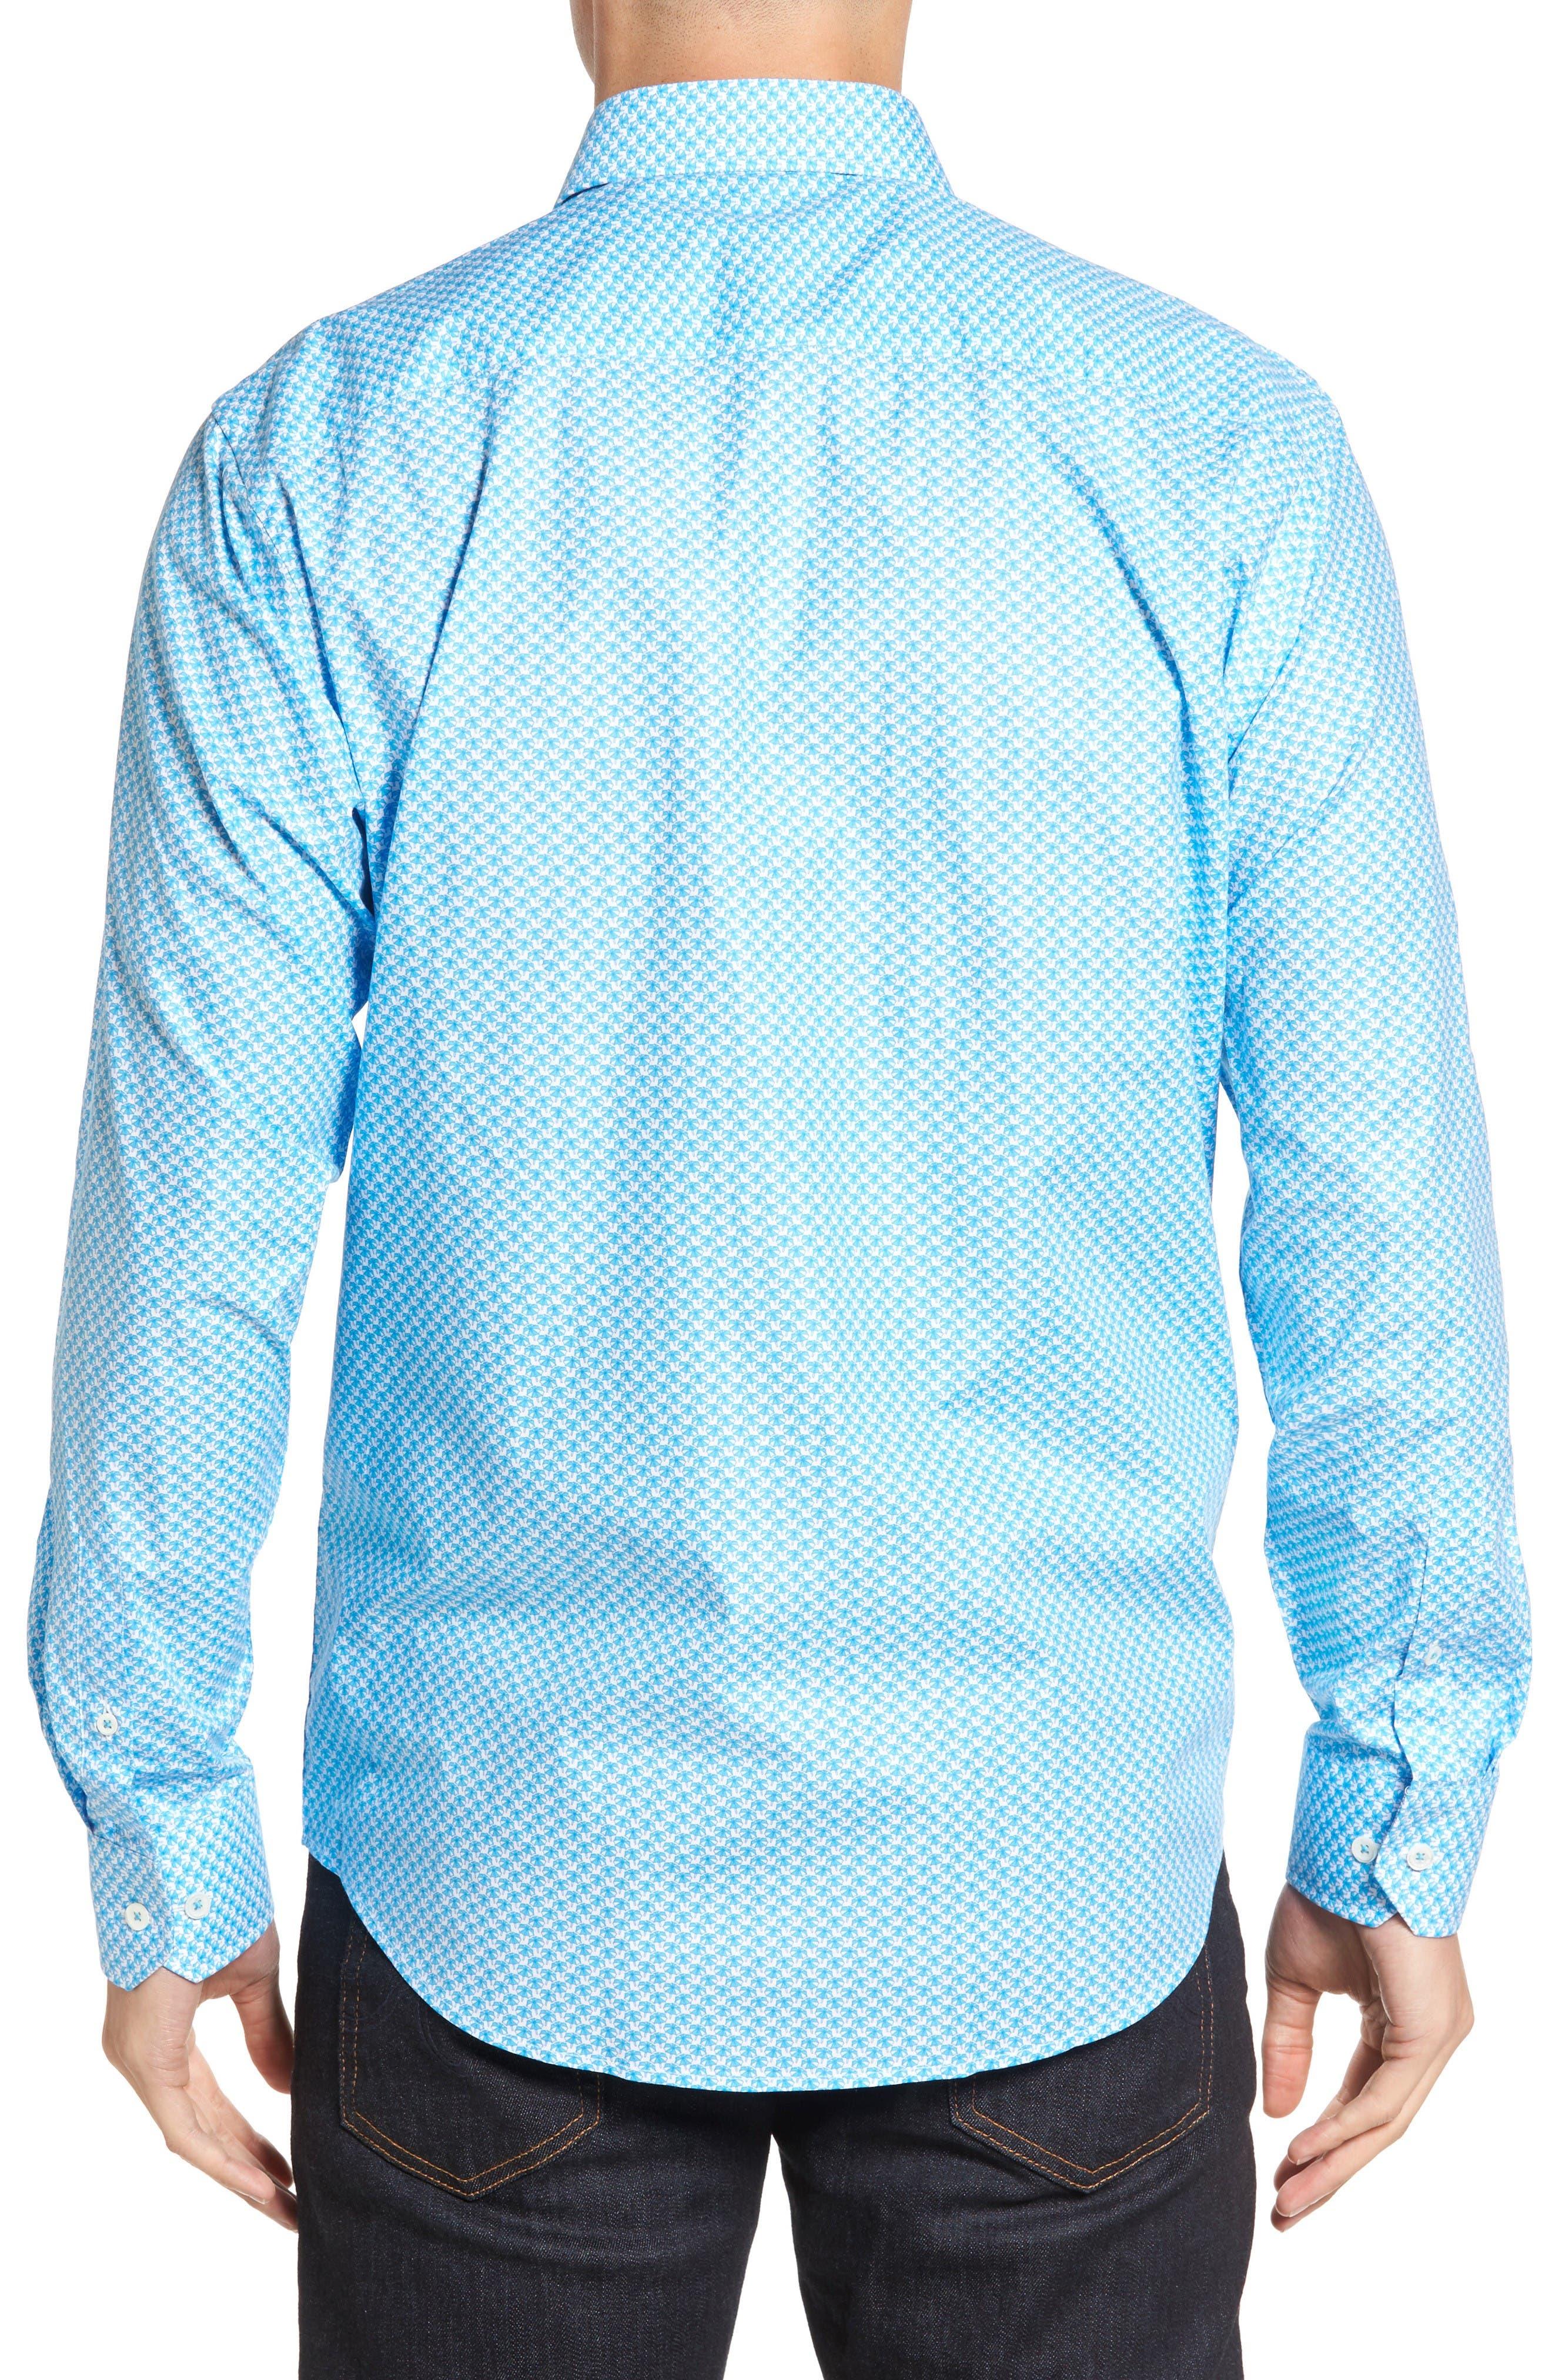 Classic Fit Umbrella Print Sport Shirt,                             Alternate thumbnail 2, color,                             Turquoise